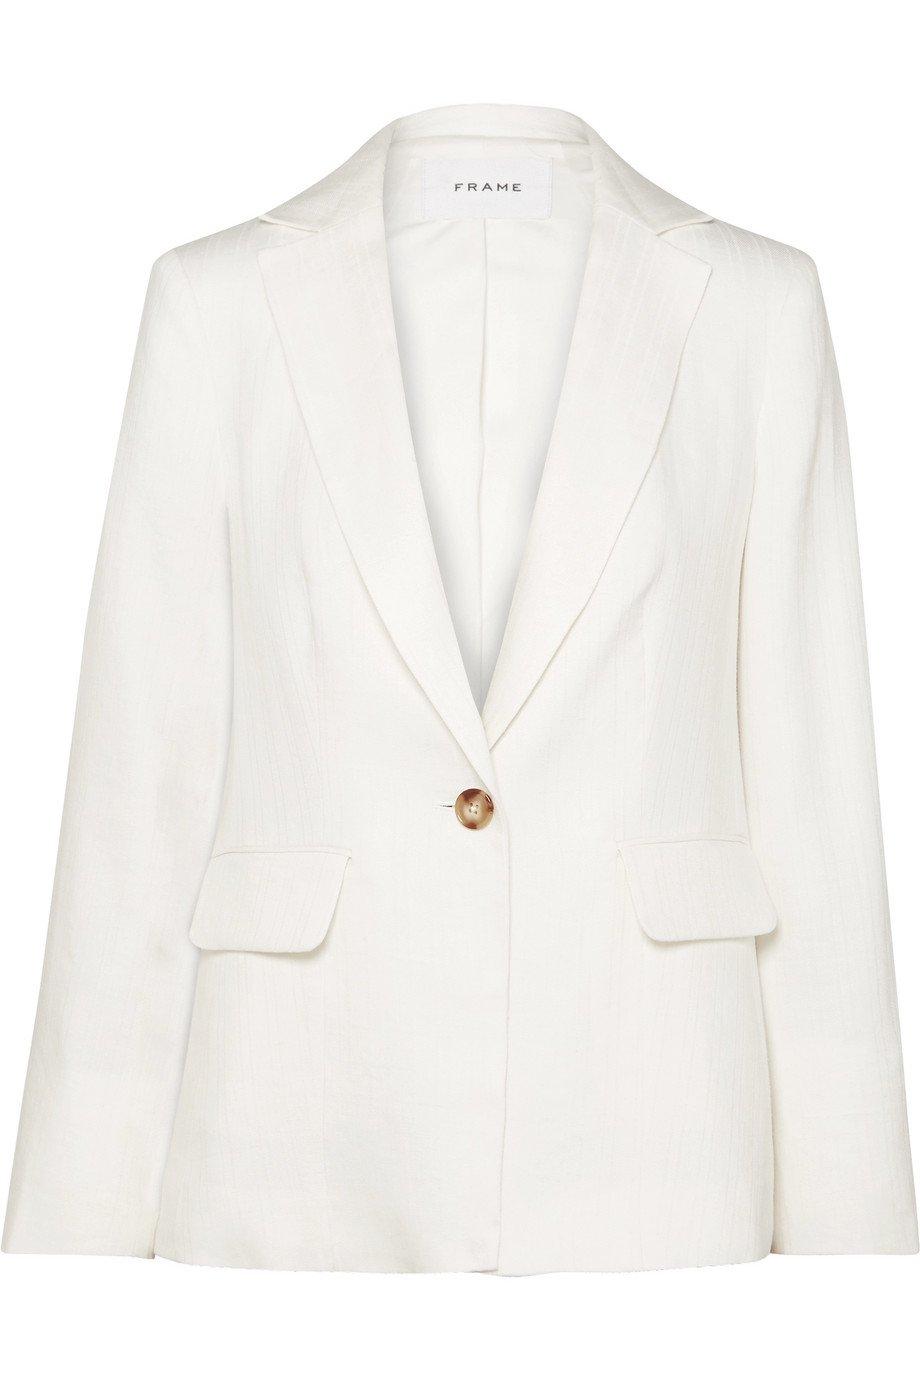 FRAME | Classic Fine linen-blend blazer | NET-A-PORTER.COM